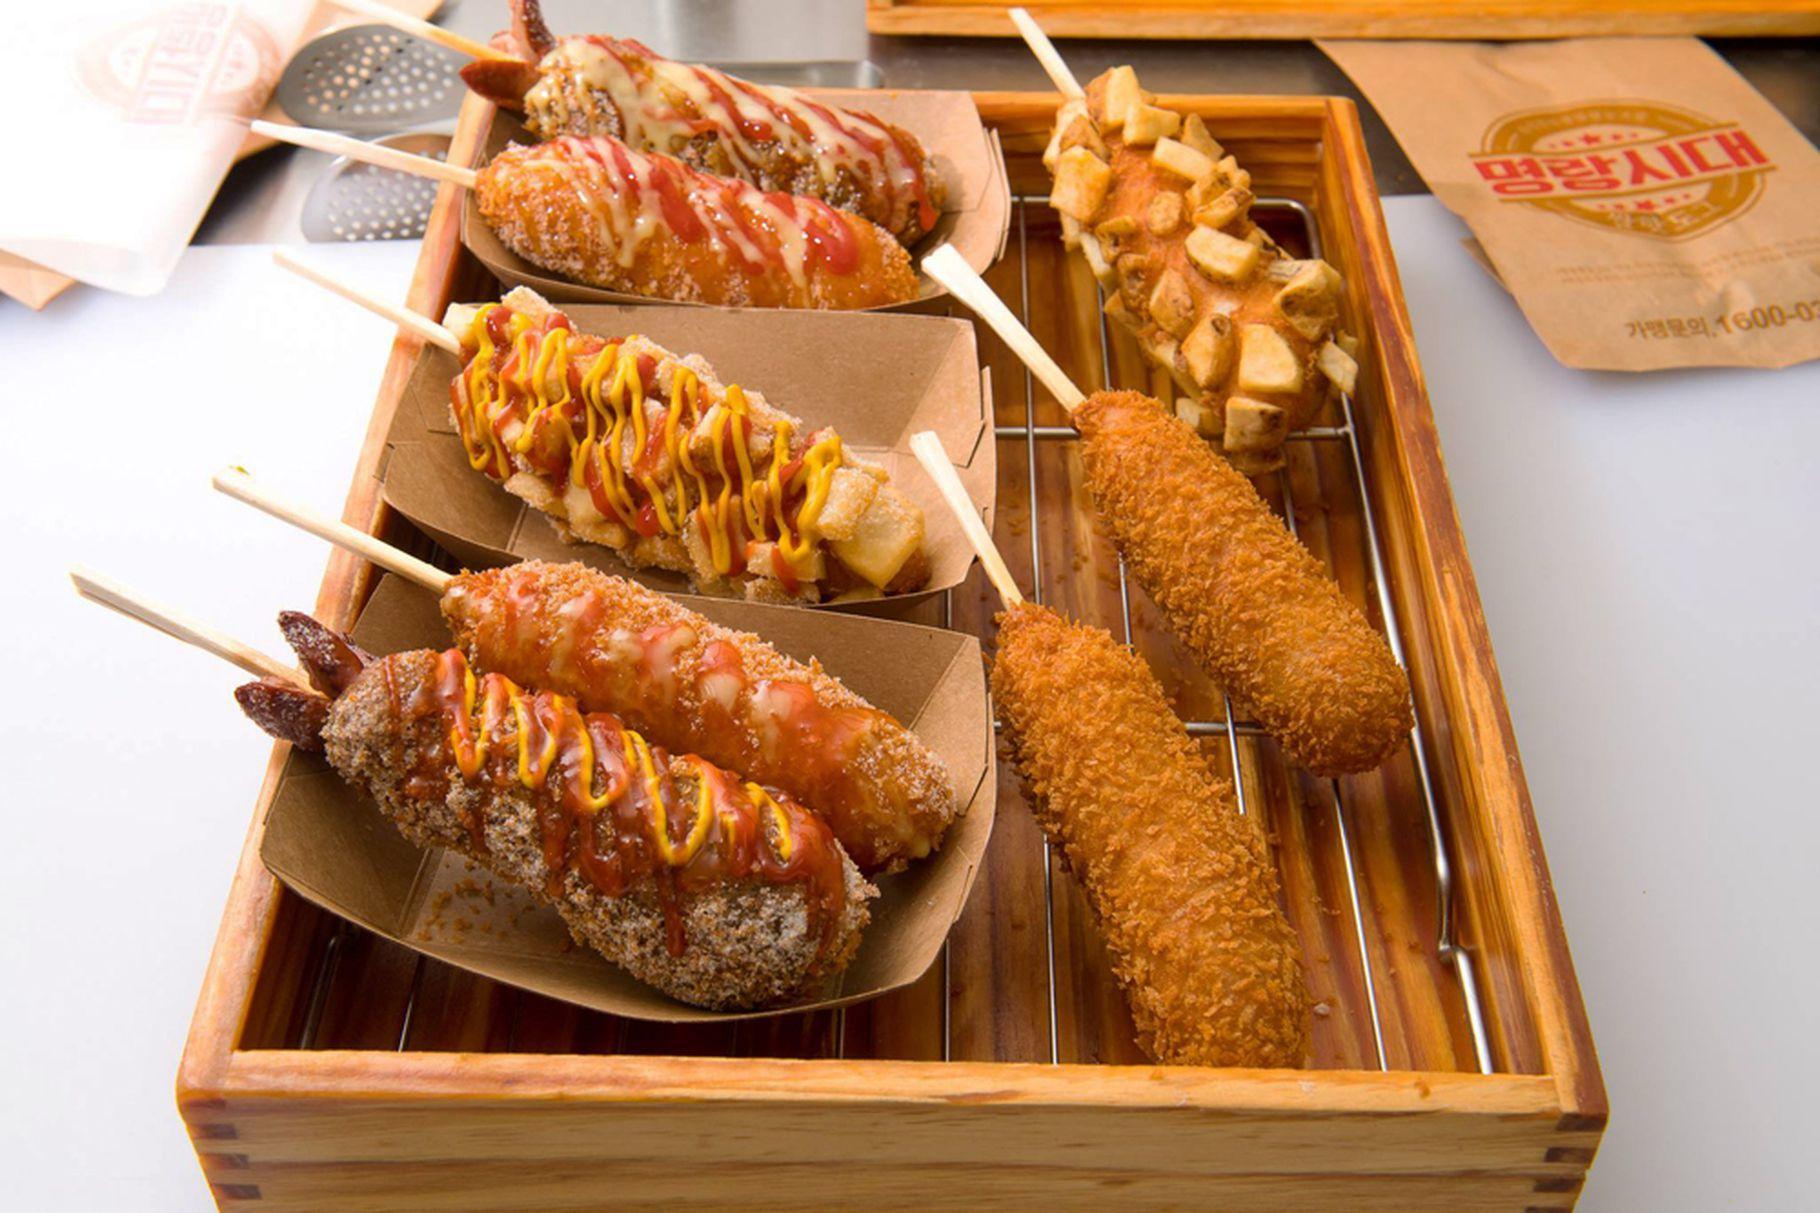 Korean street food corn dogs arrive in chinatown